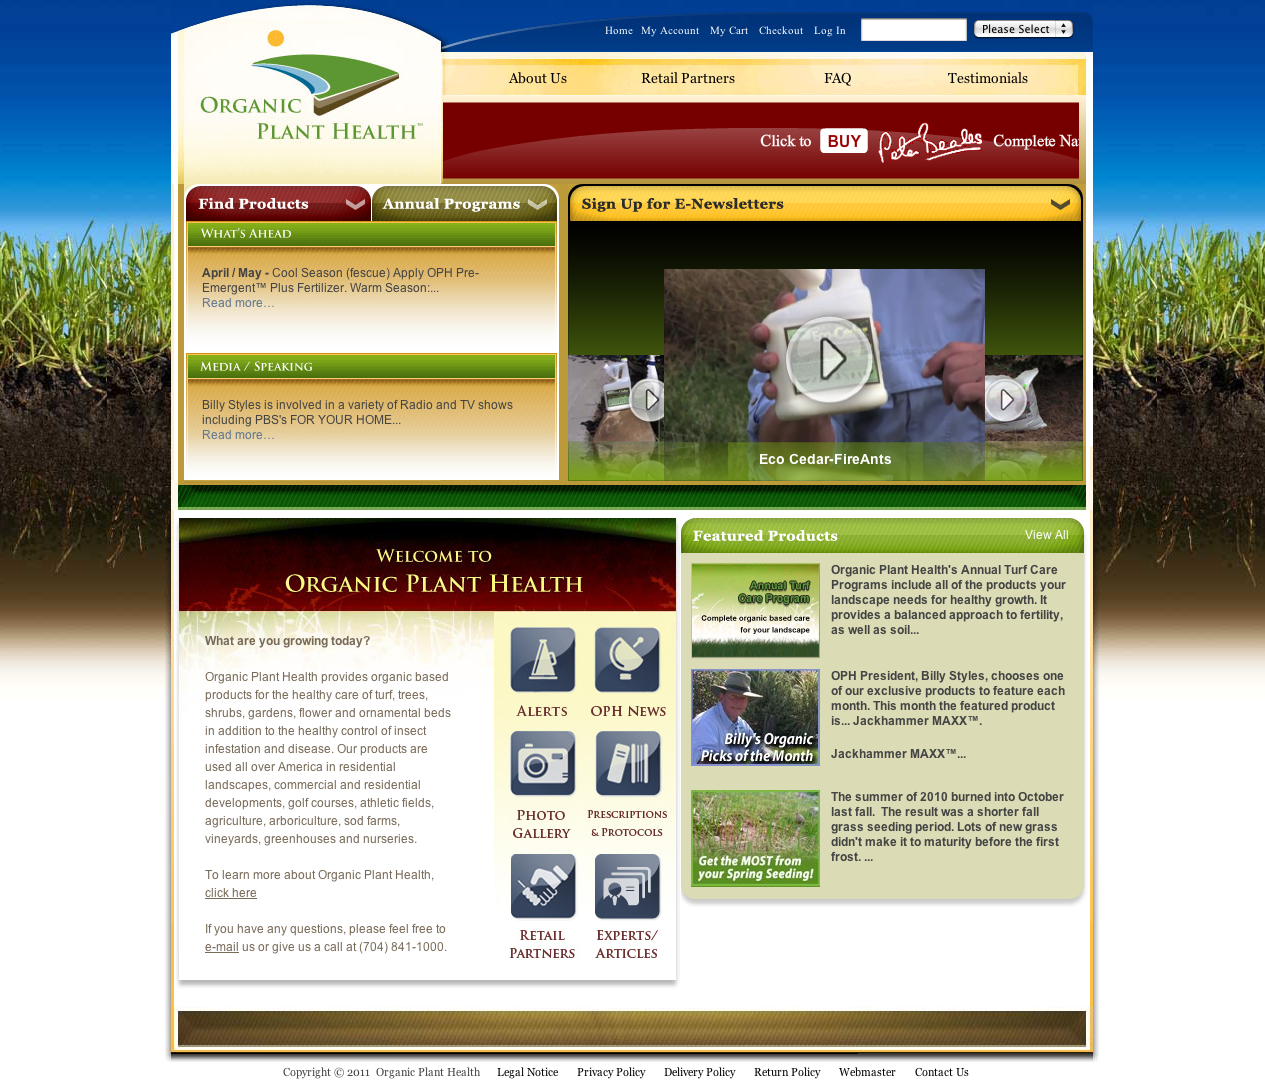 Organic Plant Health